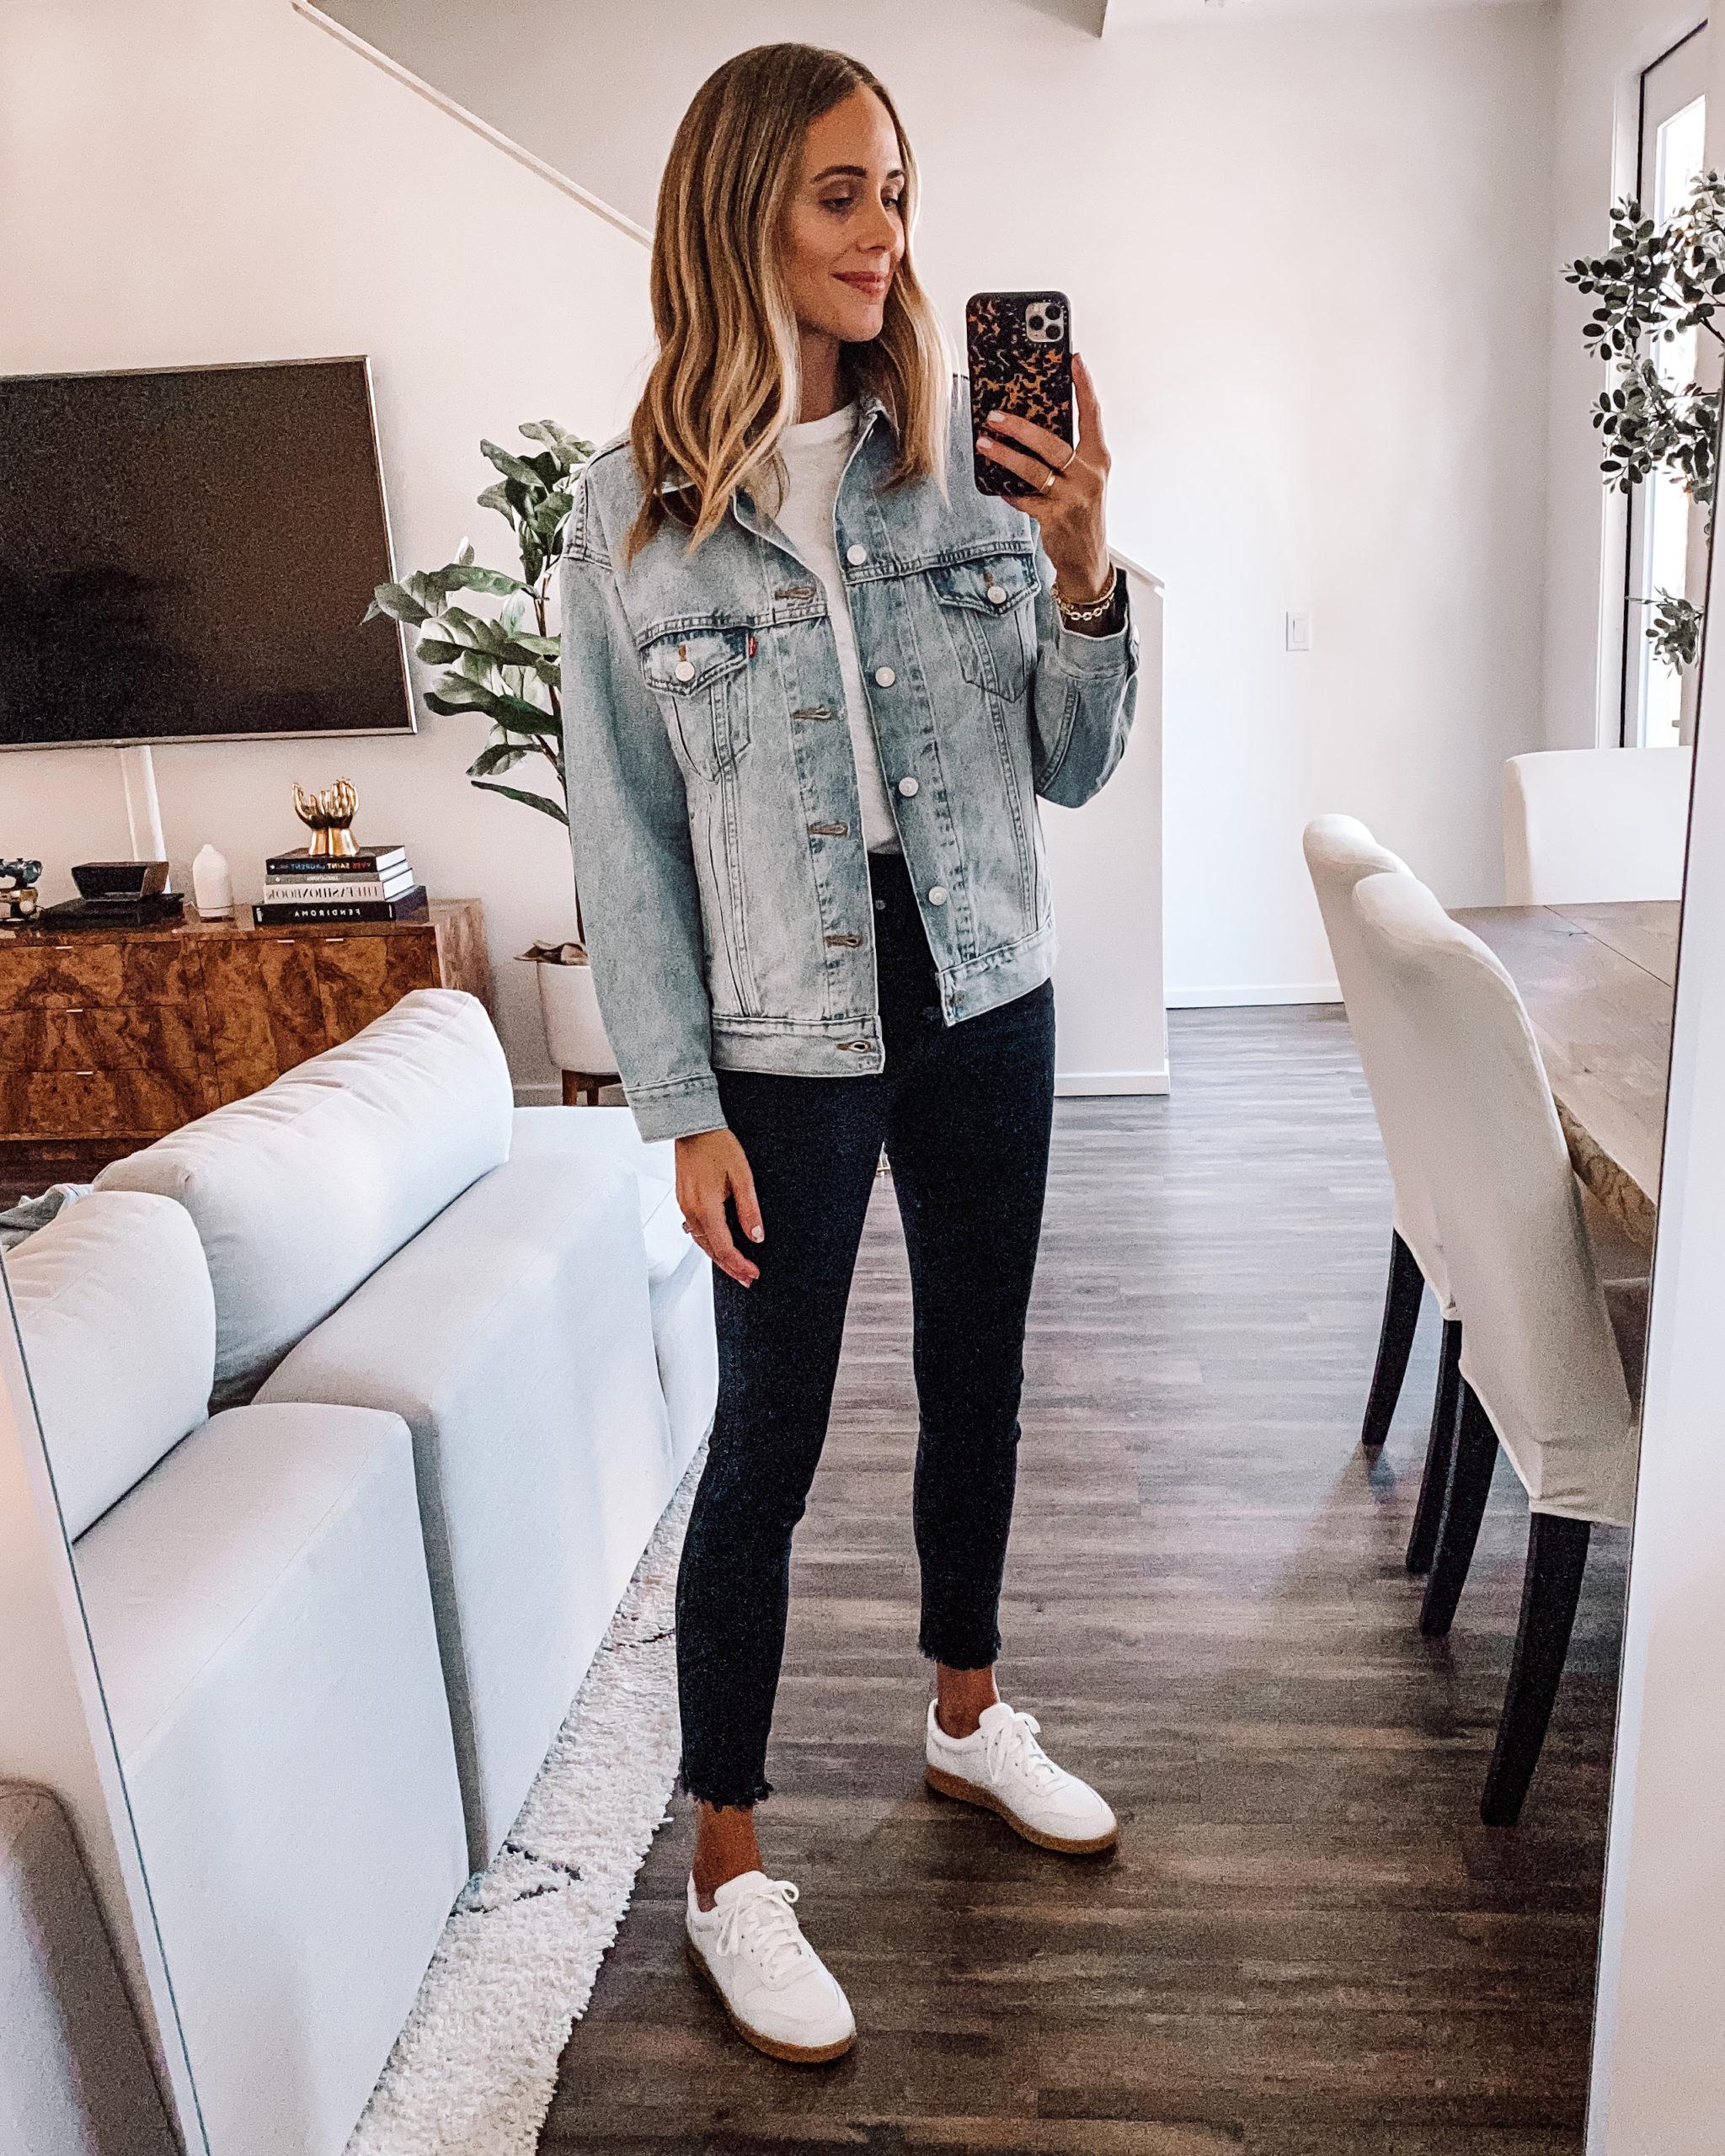 Fashion Jackson Wearing Levis Light Wash Denim Jacket White Tshirt Black Skinny Jeans Everlane White Sneakers